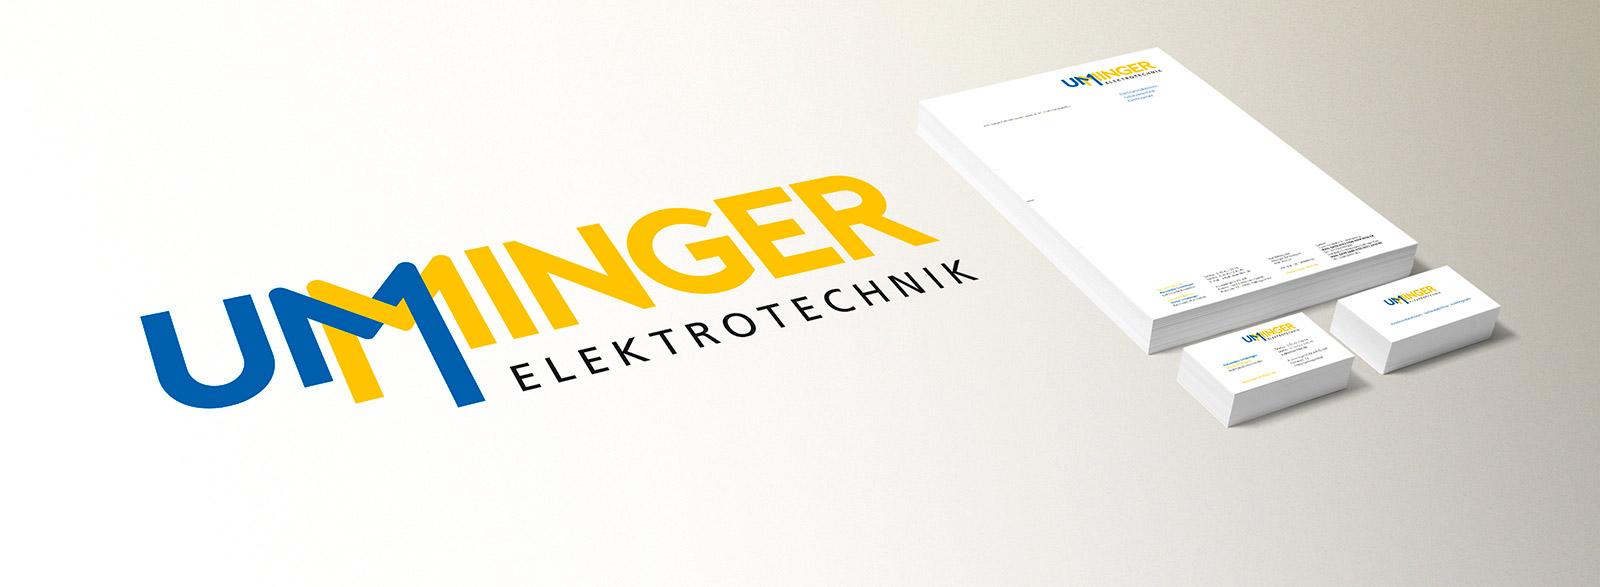 Logo, Briefpapier, Visitenkarten für Ummiger Elektrotechnik (LUMAIR Filtertechnik)